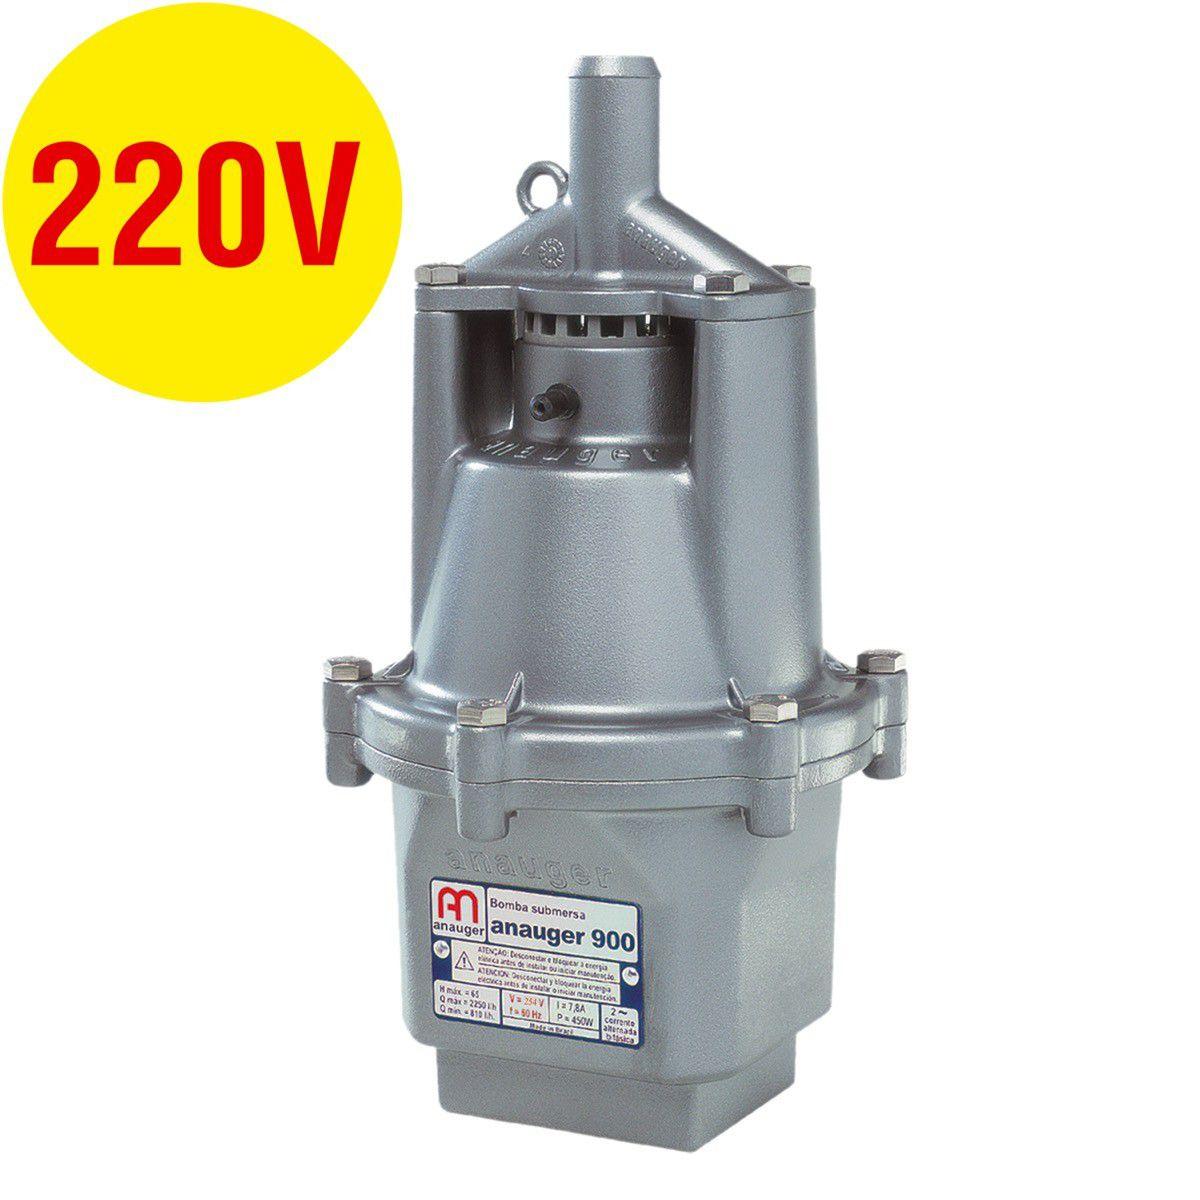 Bomba Submersa Anauger 900 450W 65Mt 220V